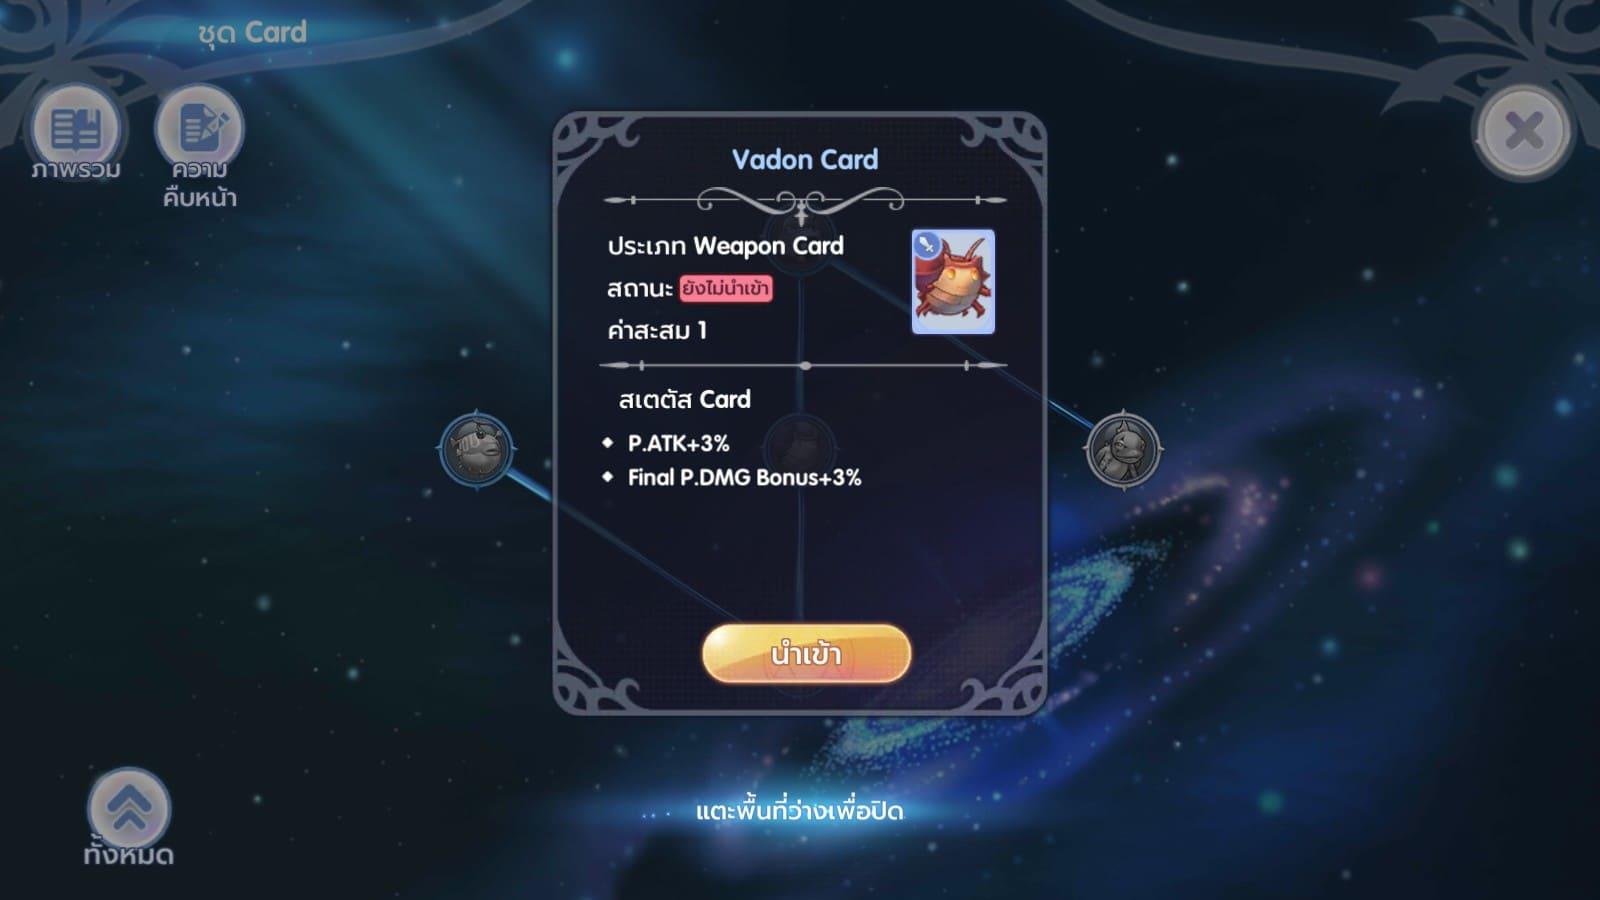 ROX - Vadon Card การ์ดสายกายภาพ